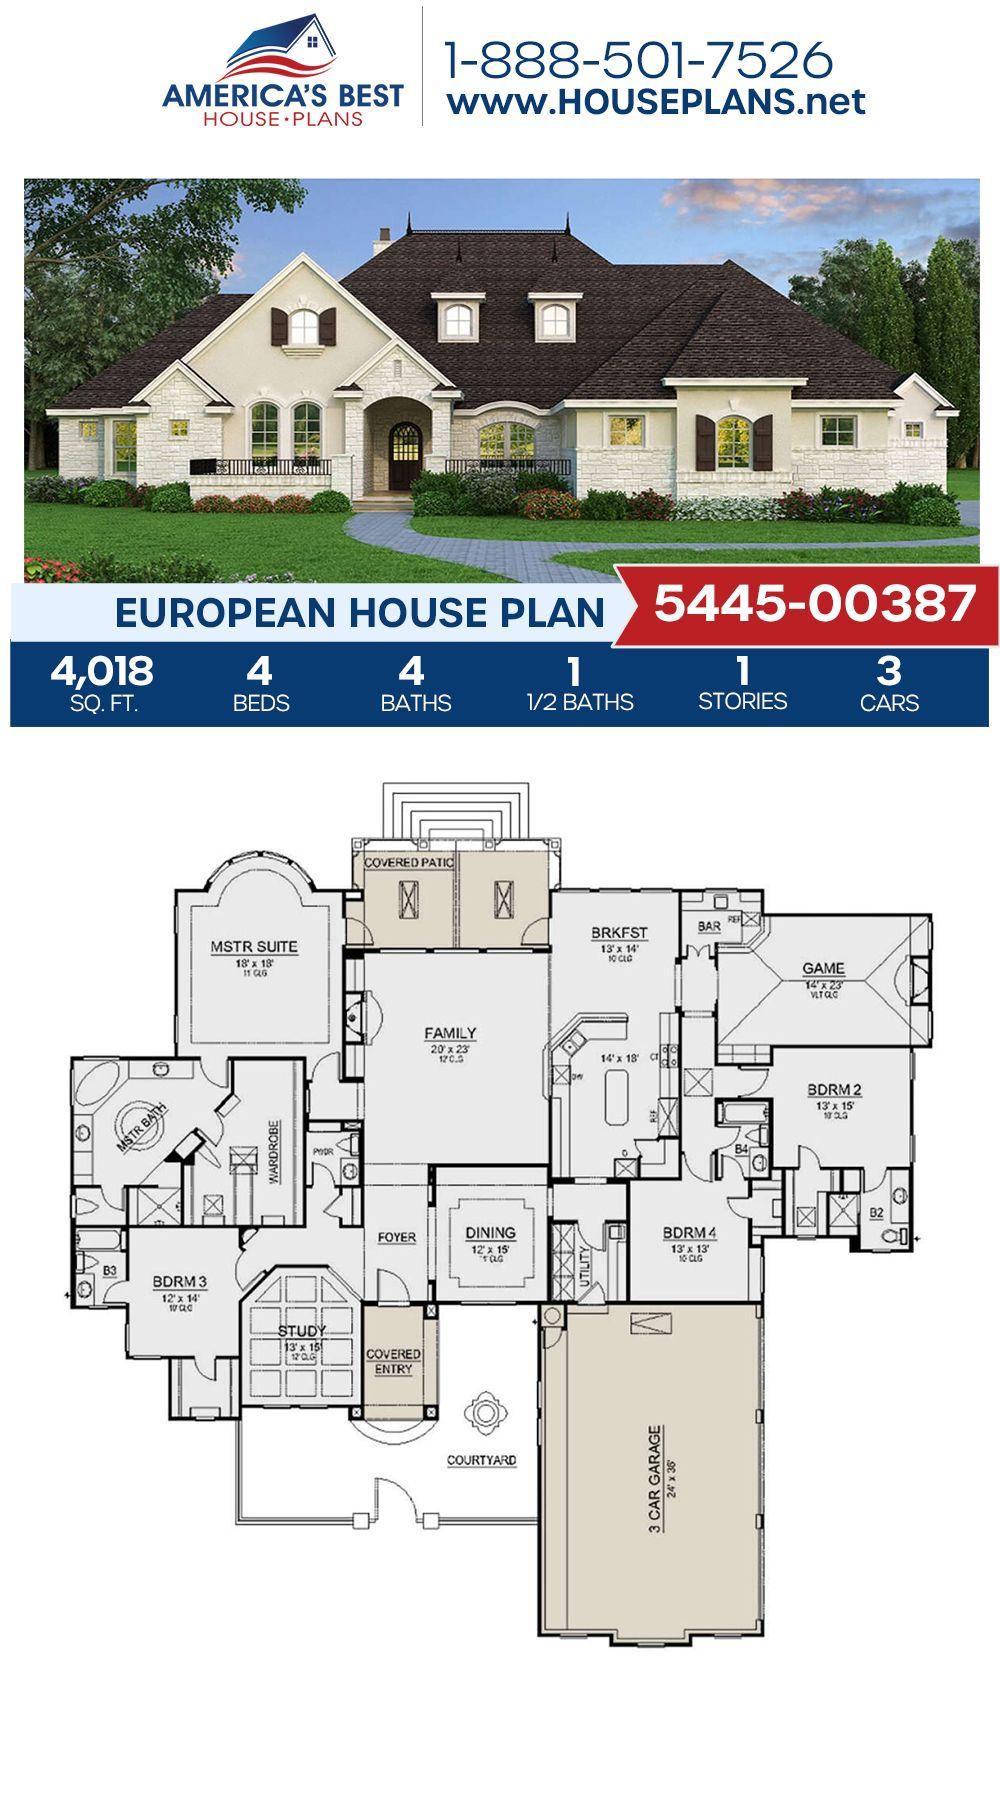 House Plan 5445 00387 European Plan 4 018 Square Feet 4 Bedrooms 4 5 Bathrooms Craftsman House Plans Open House Plans European House